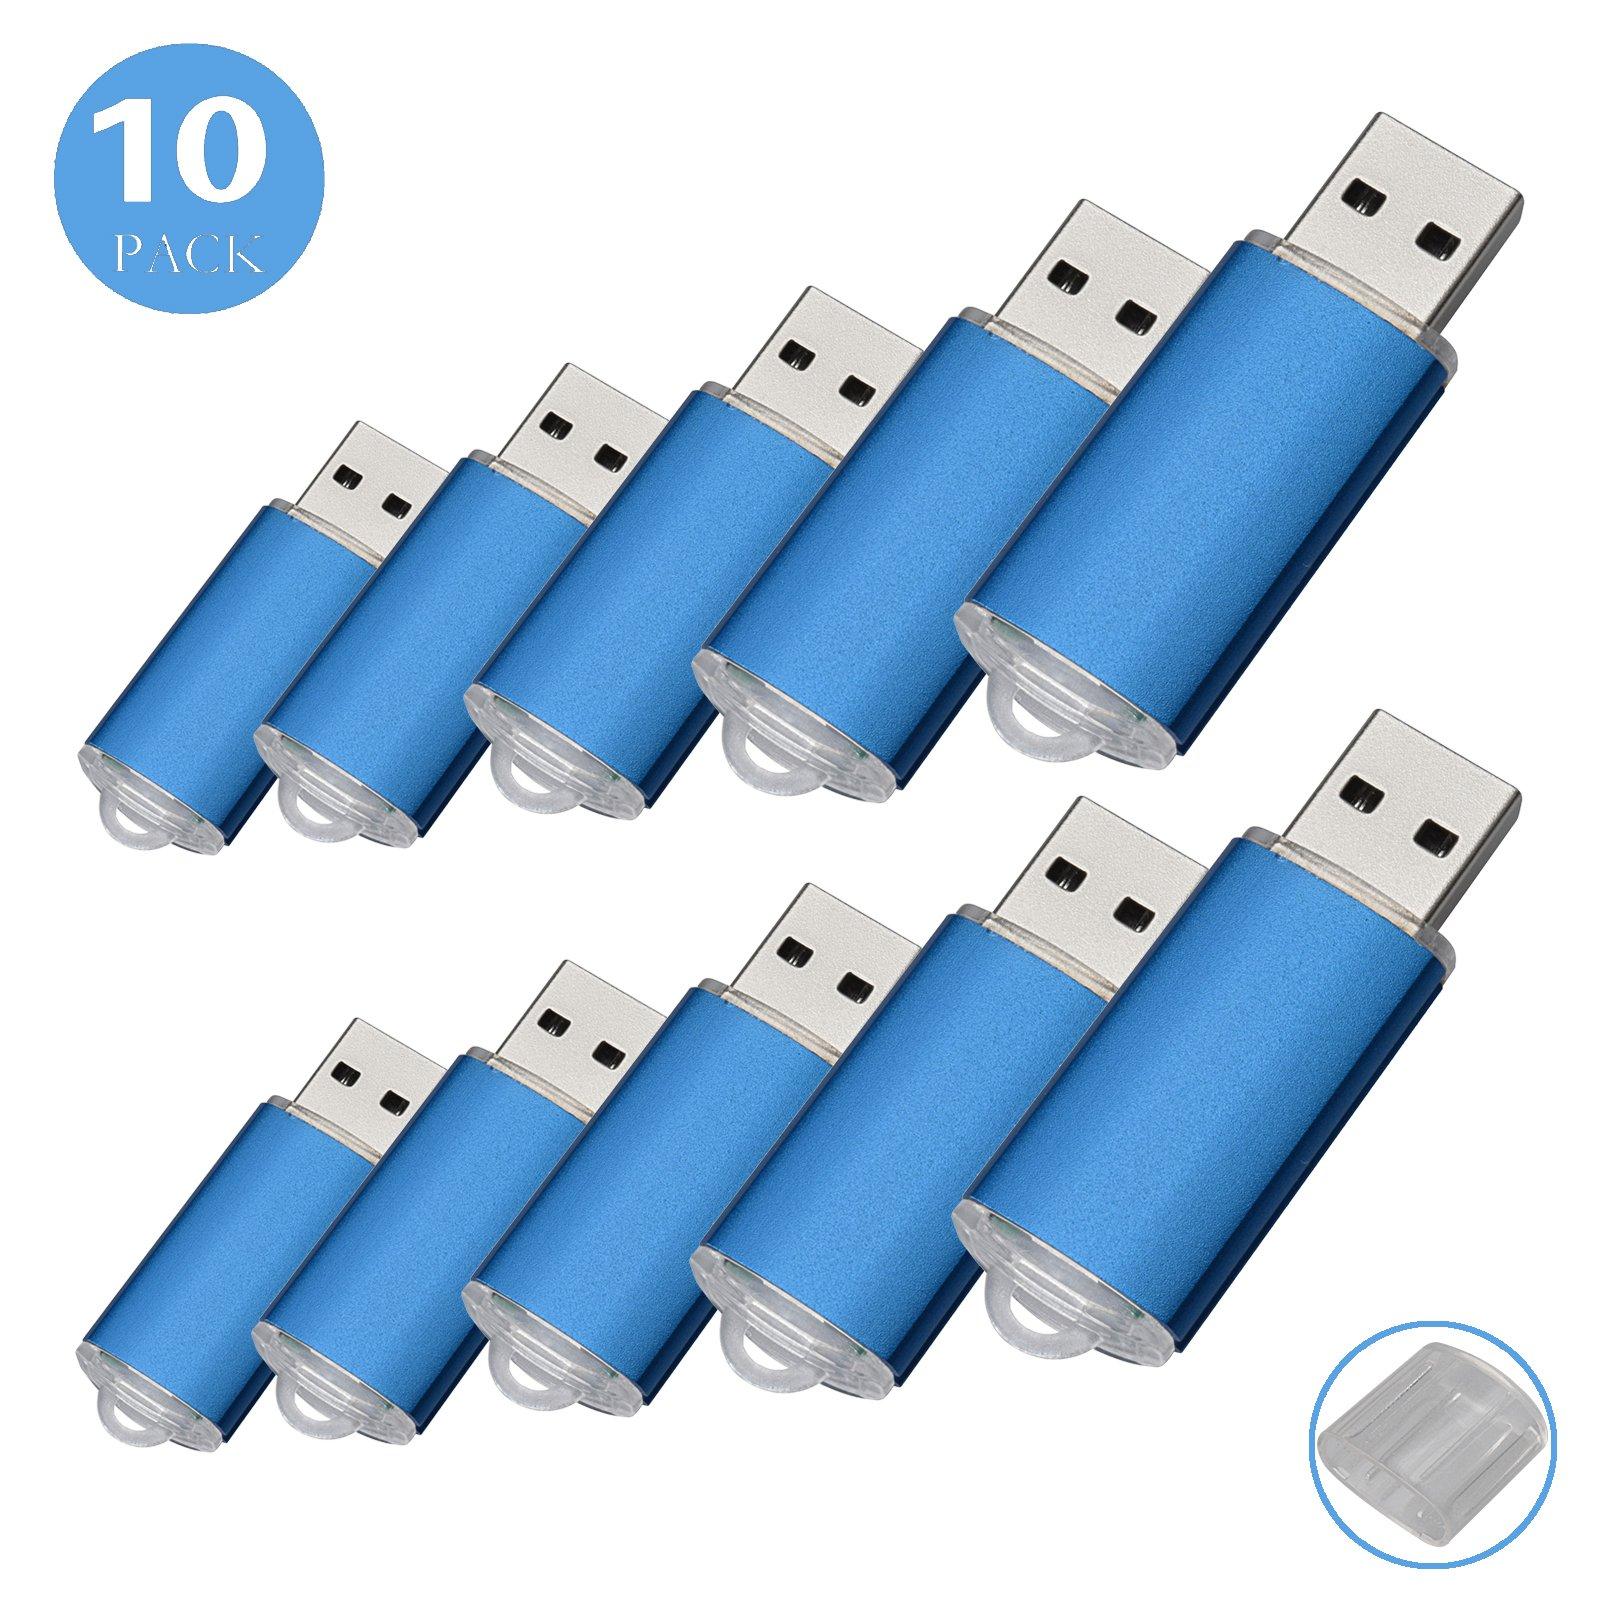 RAOYI 10Pack 1GB 1G USB Flash Drive USB 2.0 Memory Stick Bulk Thumb Drives Pen Drive Blue